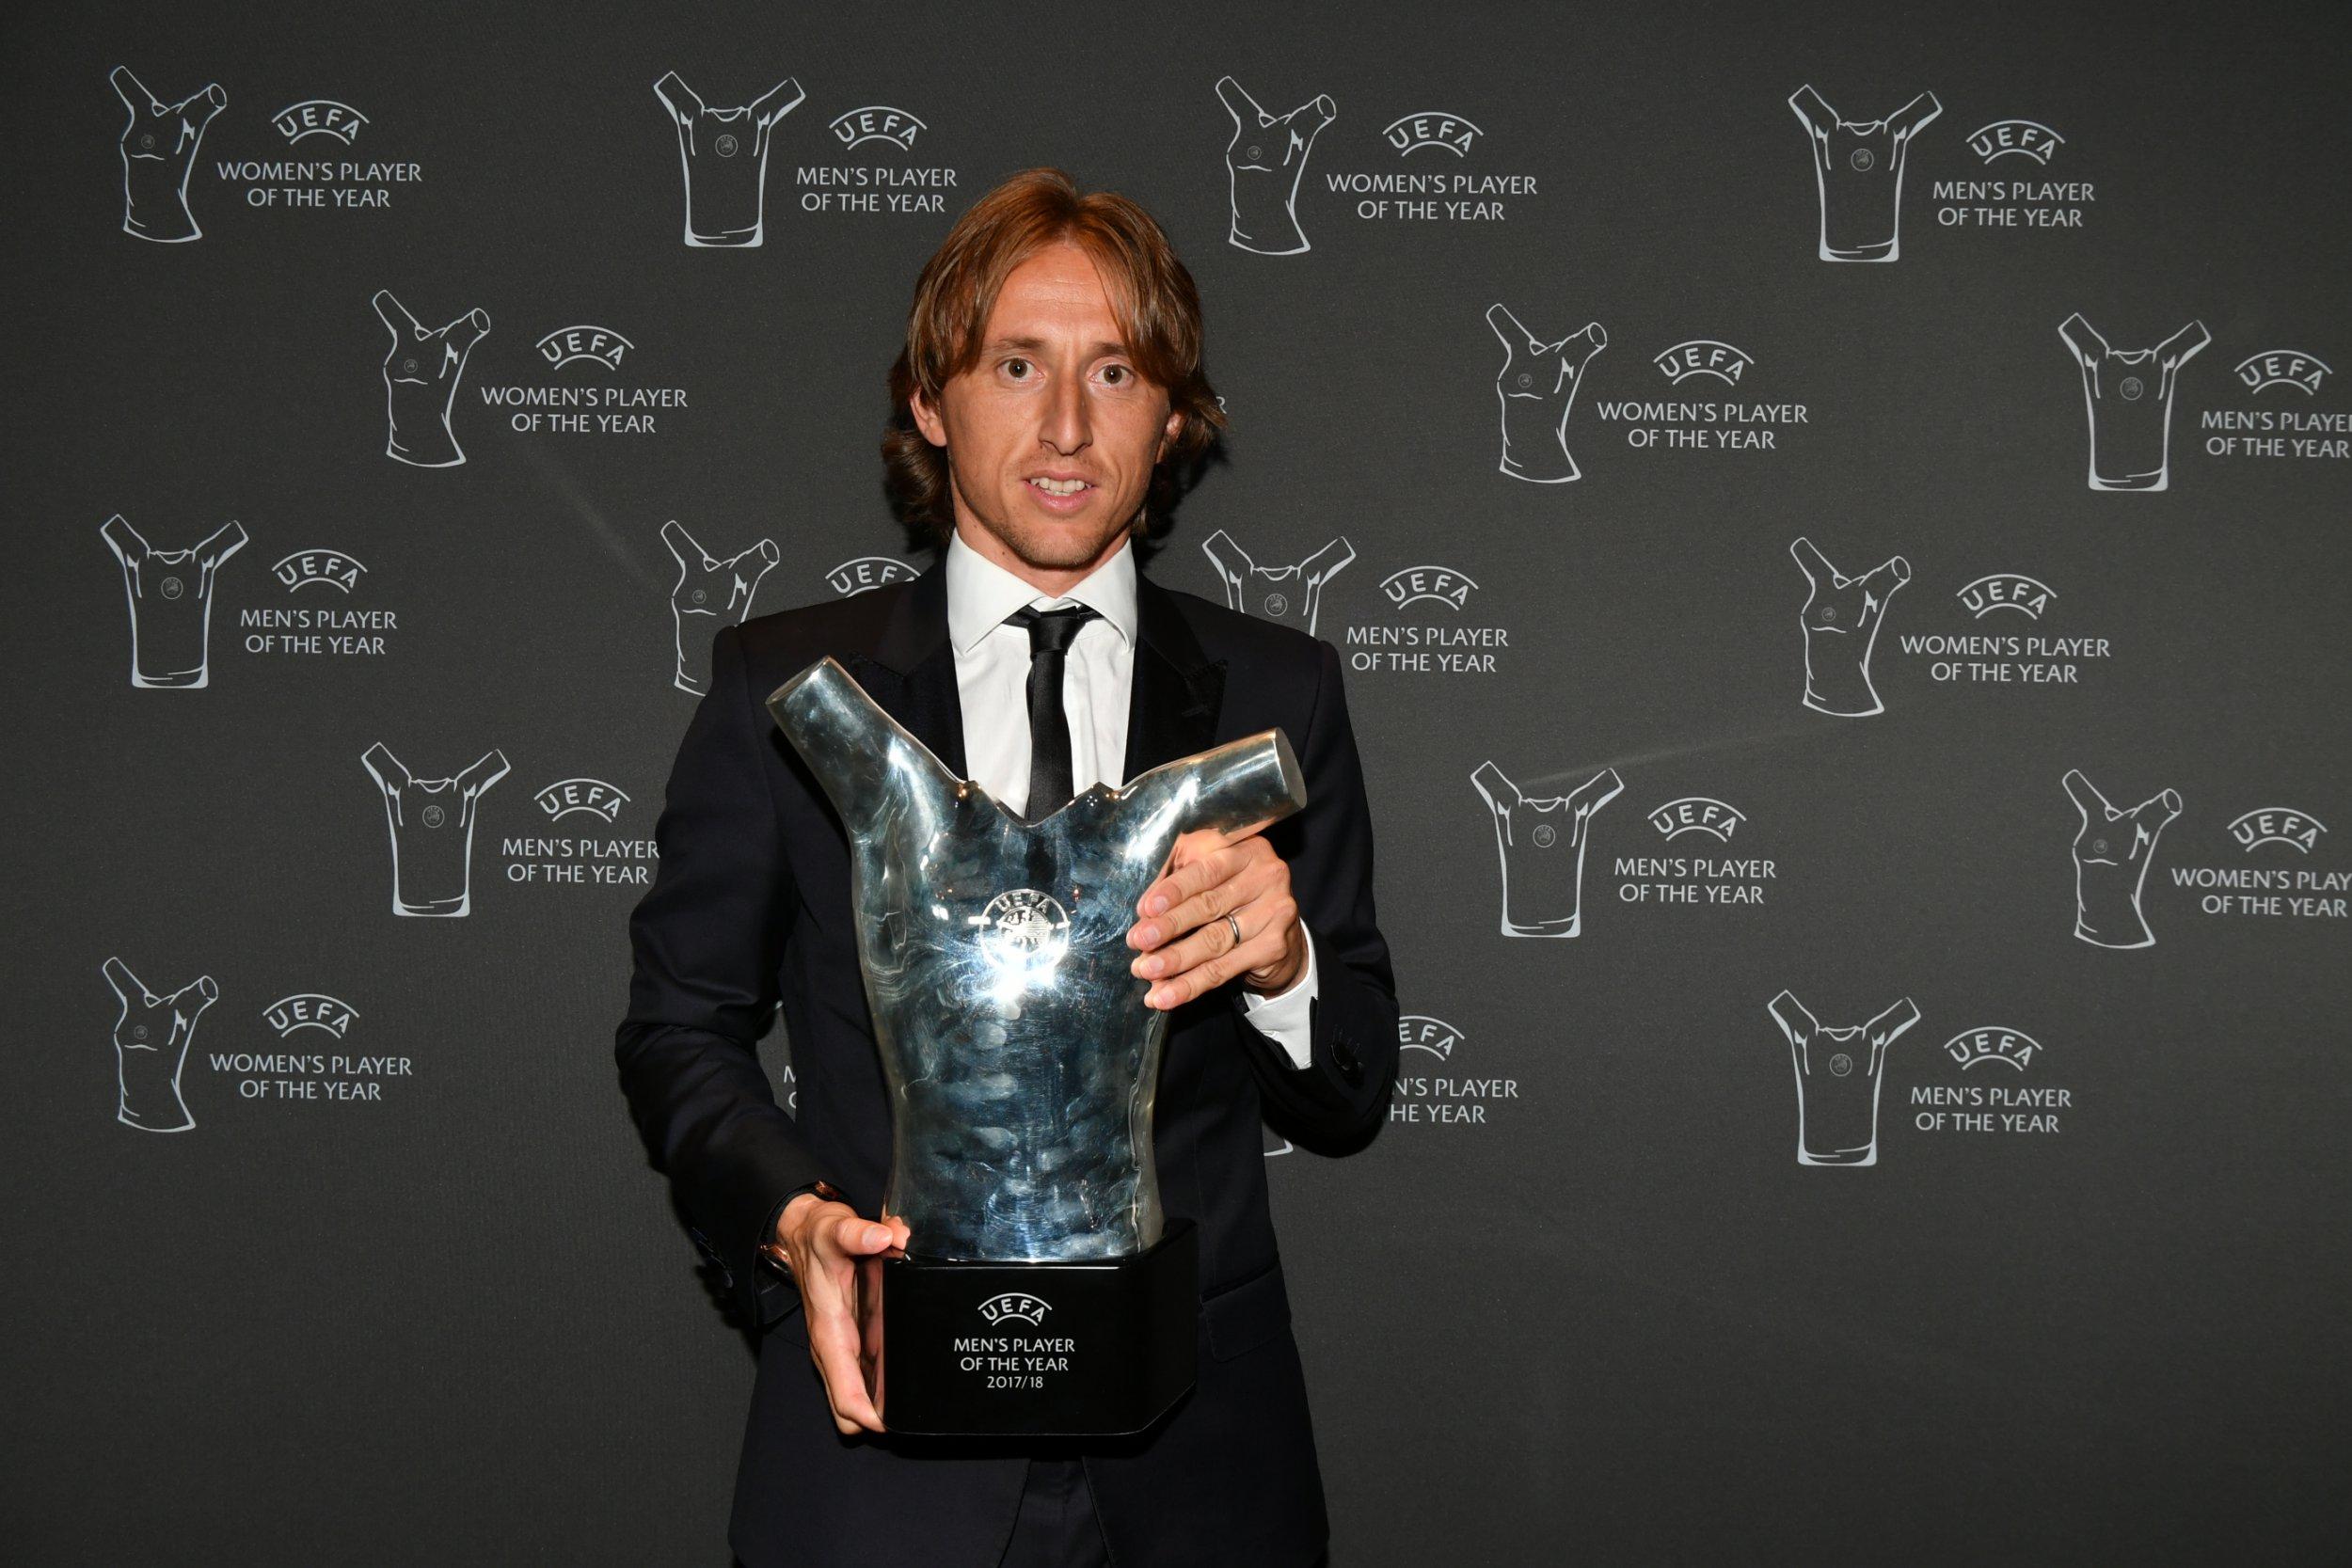 Cristiano Ronaldo's sister aims dig at Luka Modric for winning UEFA Player of the Year award